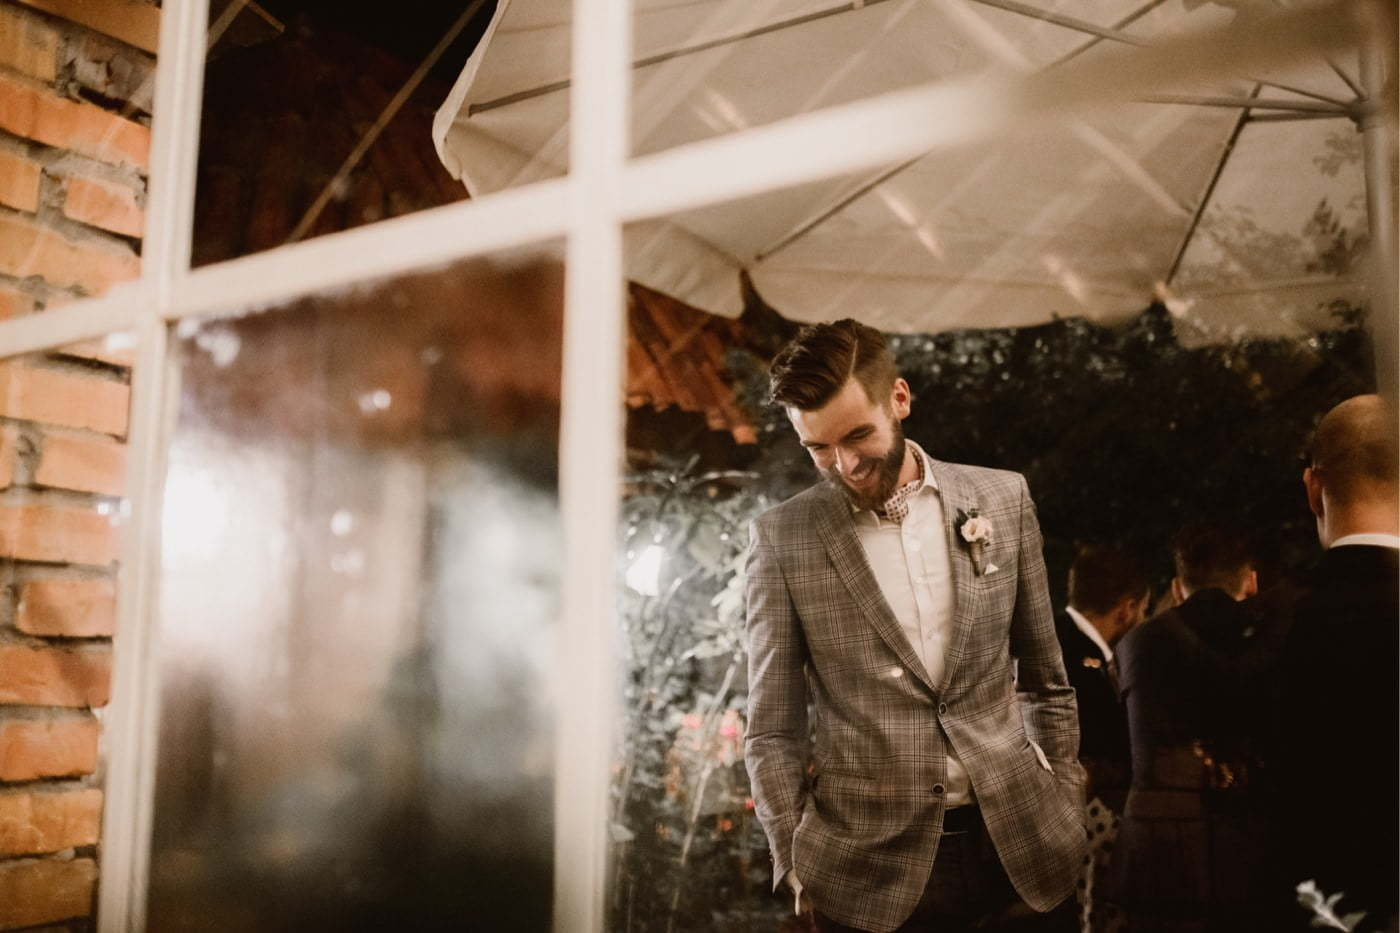 ewelina zieba rustykalne wesele stara oranzeria warszawa 100